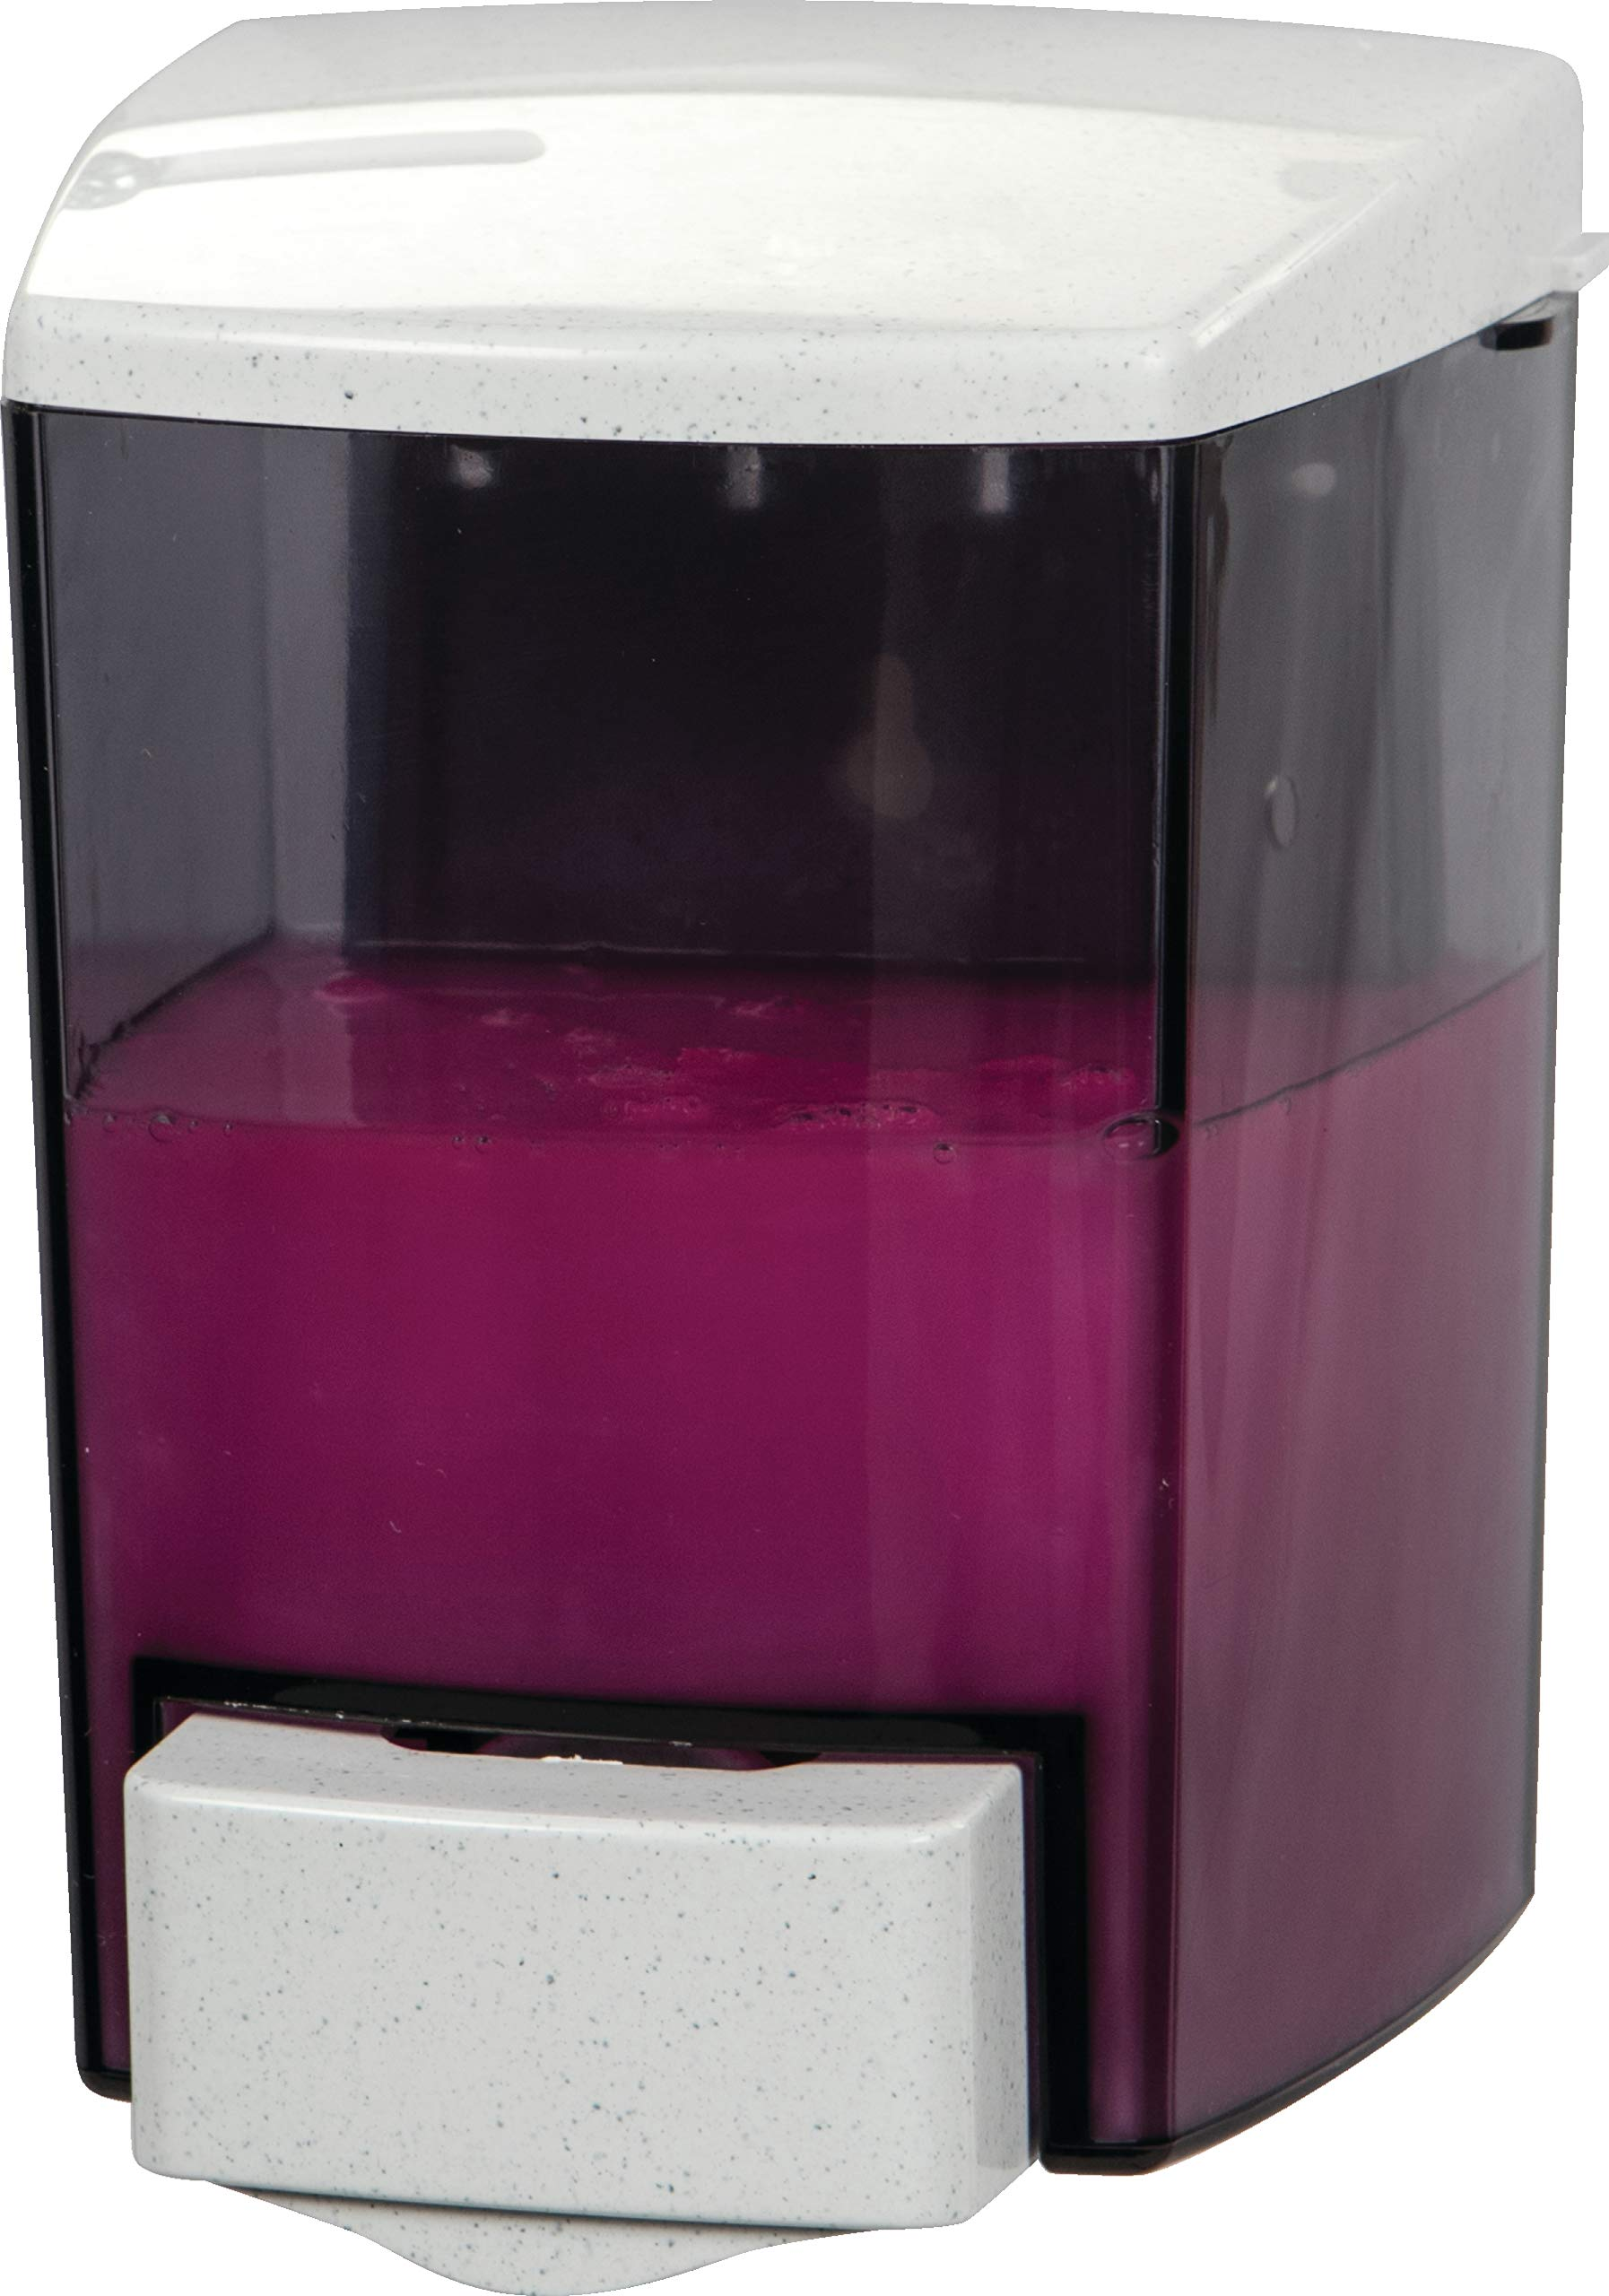 San Jamar S30 Classic Wall-Mount Liquid Soap Dispenser, 30 oz Capacity, Black Pearl